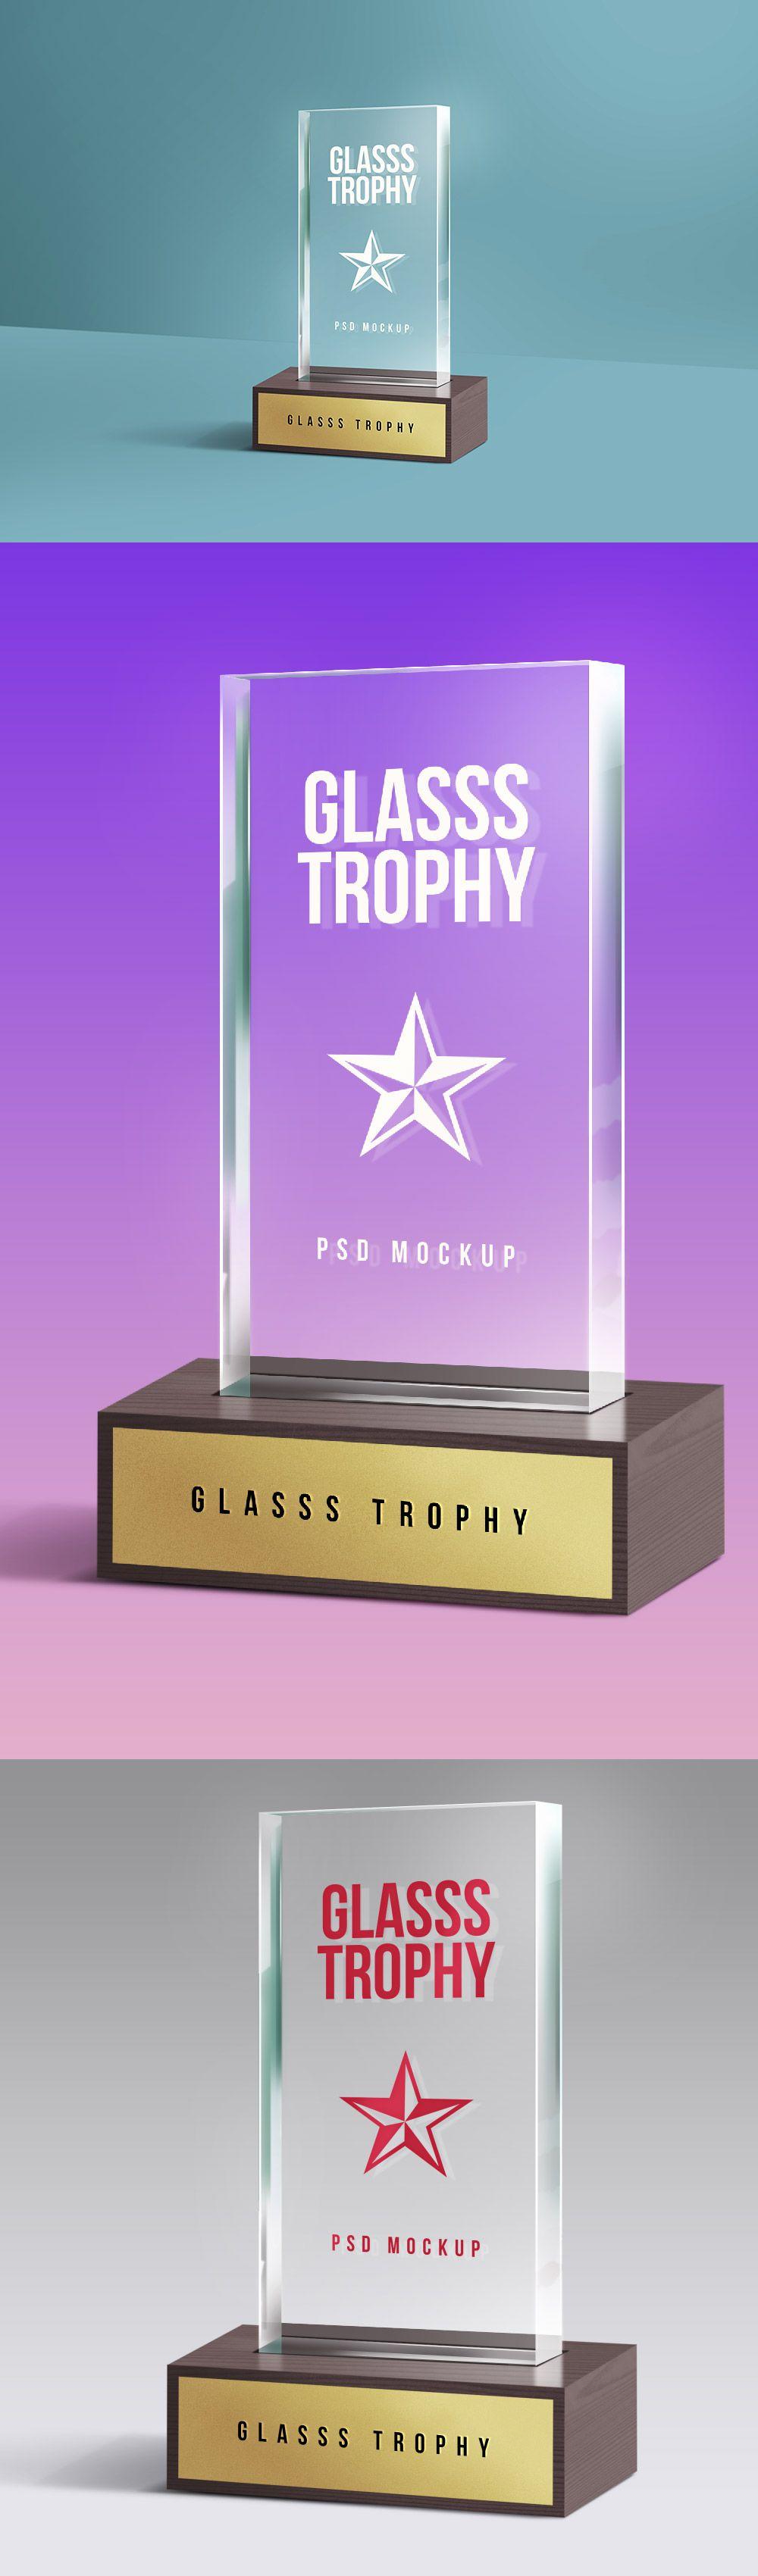 Glass Trophy PSD Mockup STOCK EXCHANGE Pinterest